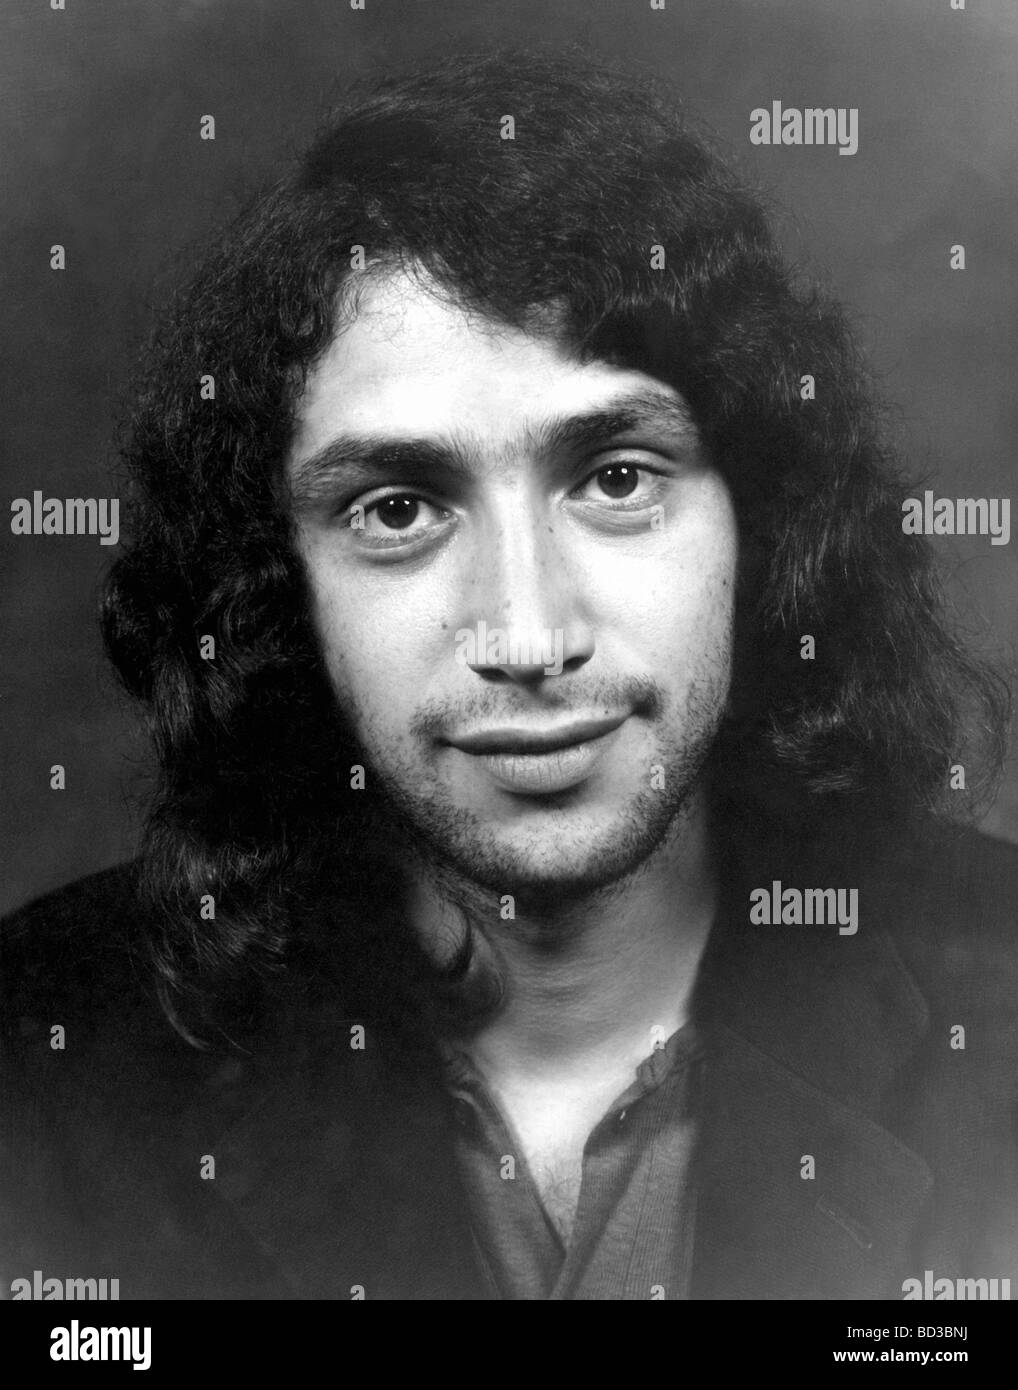 FOCUS  1970s Dutch rock group - unidentified member - Stock Image